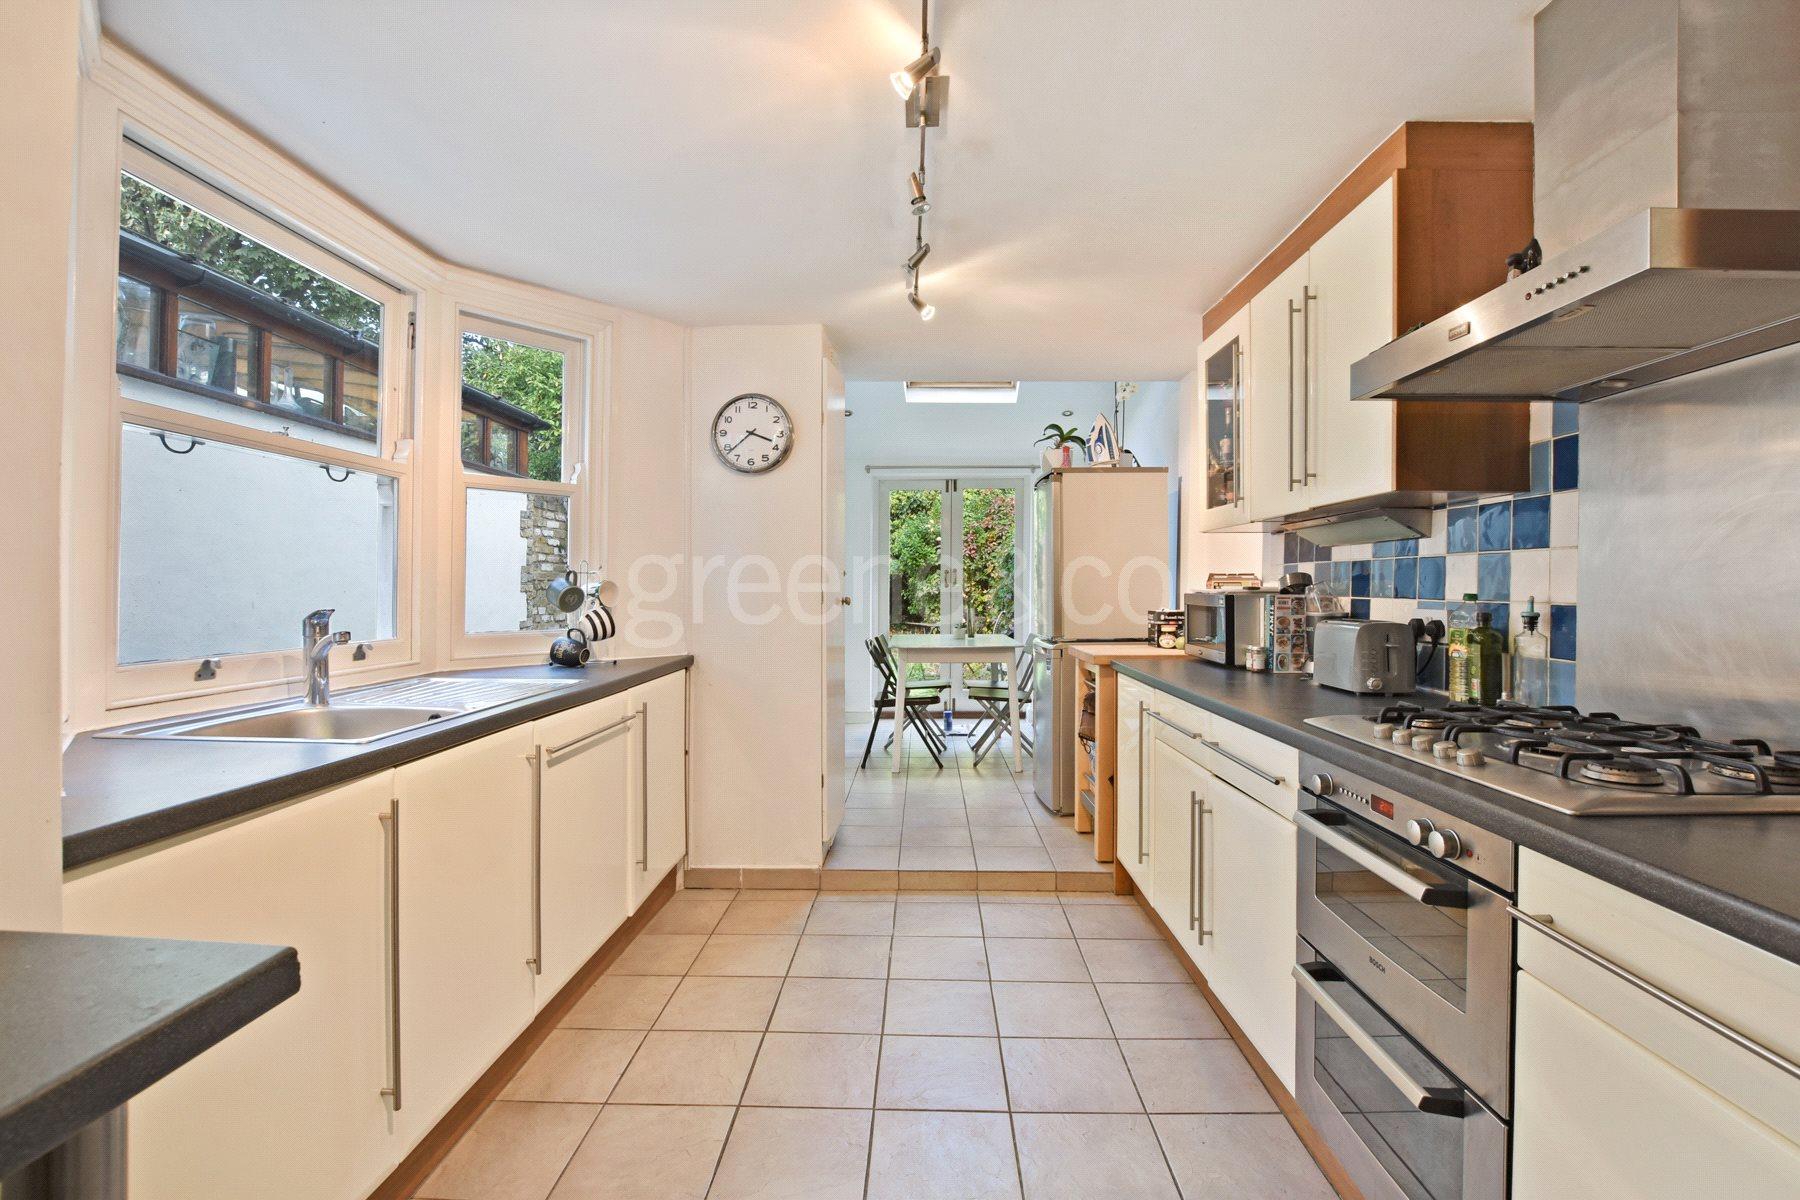 3 Bedrooms Terraced House for sale in Bracey Street, Stroud Green, London, N4